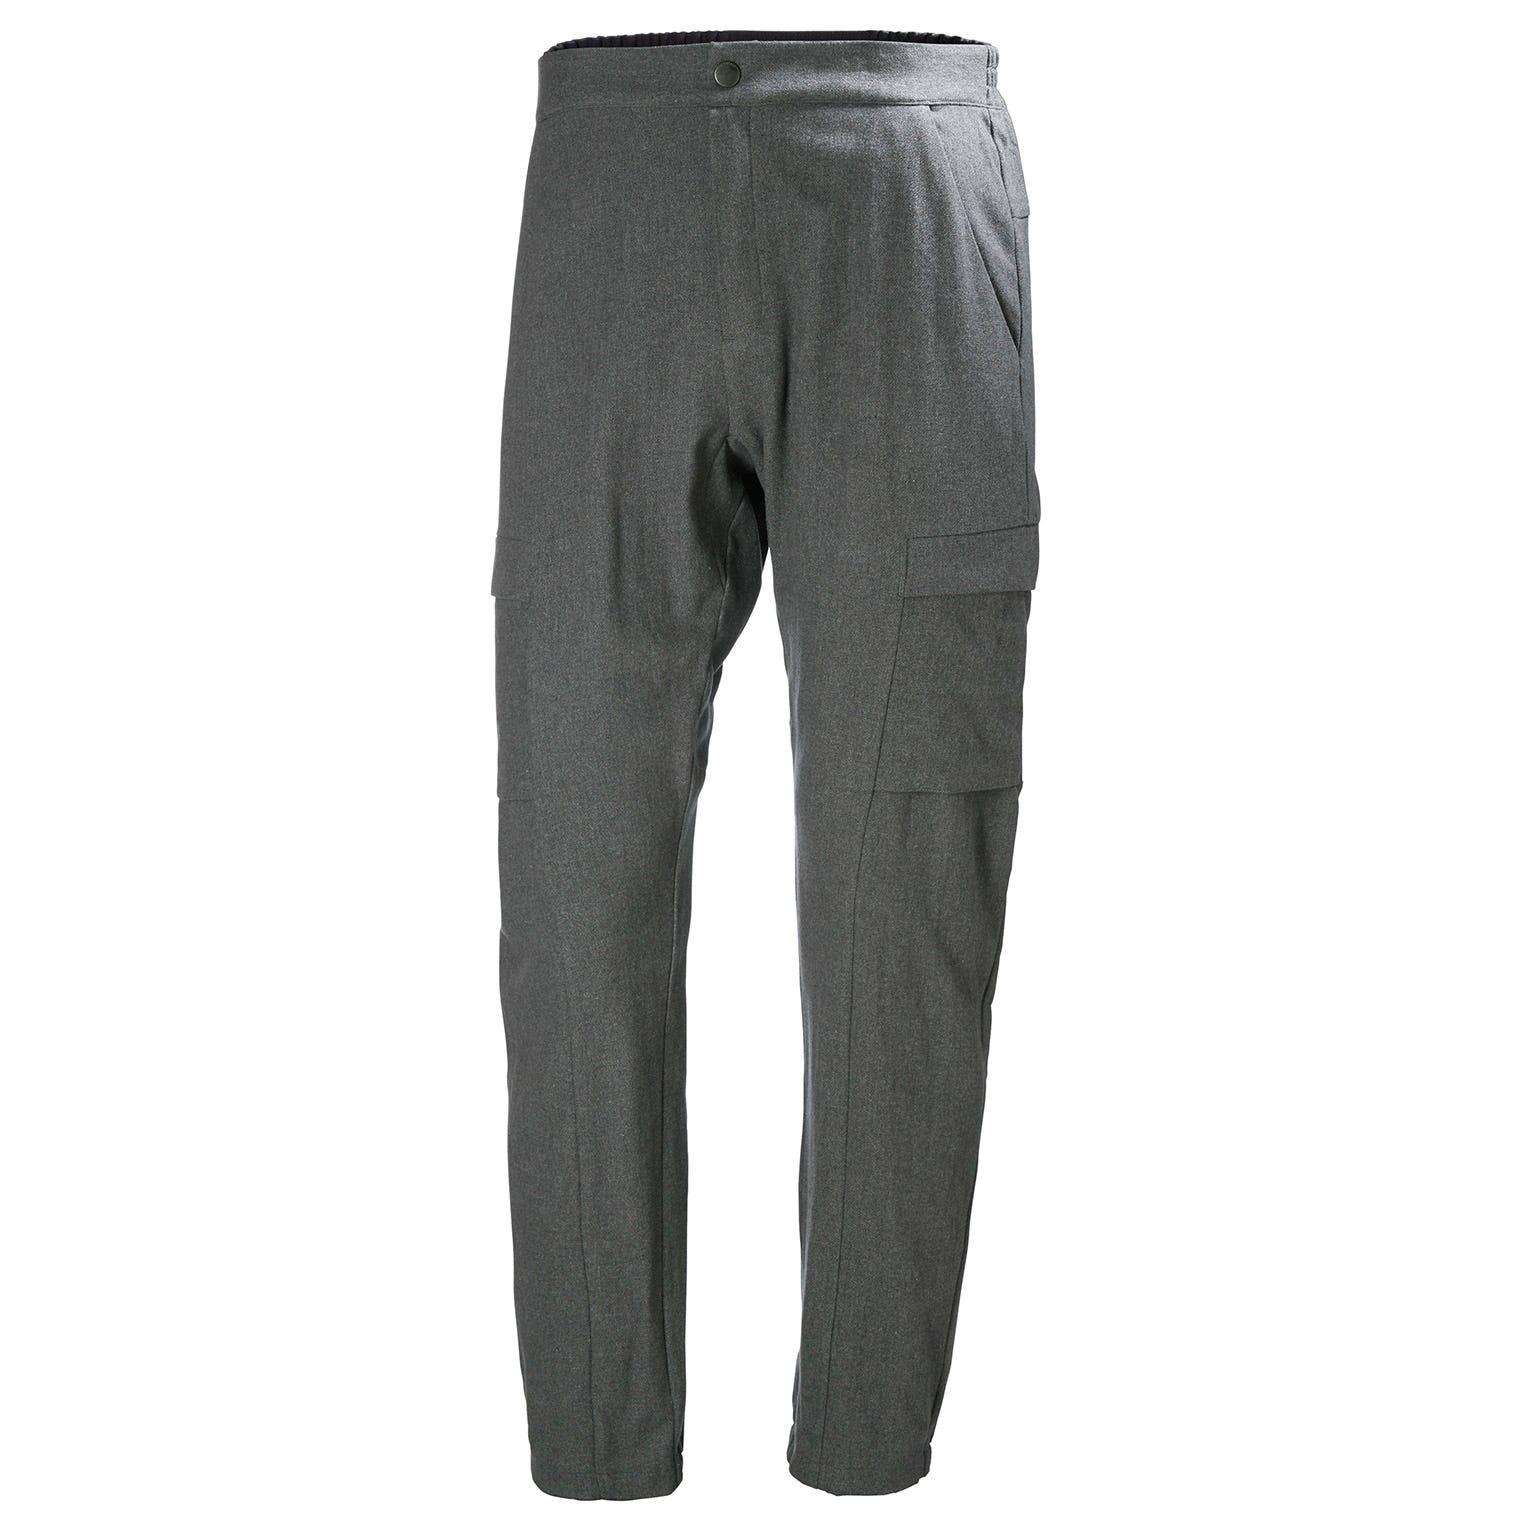 Helly Hansen Wool Travel Hiking Pant Grey M